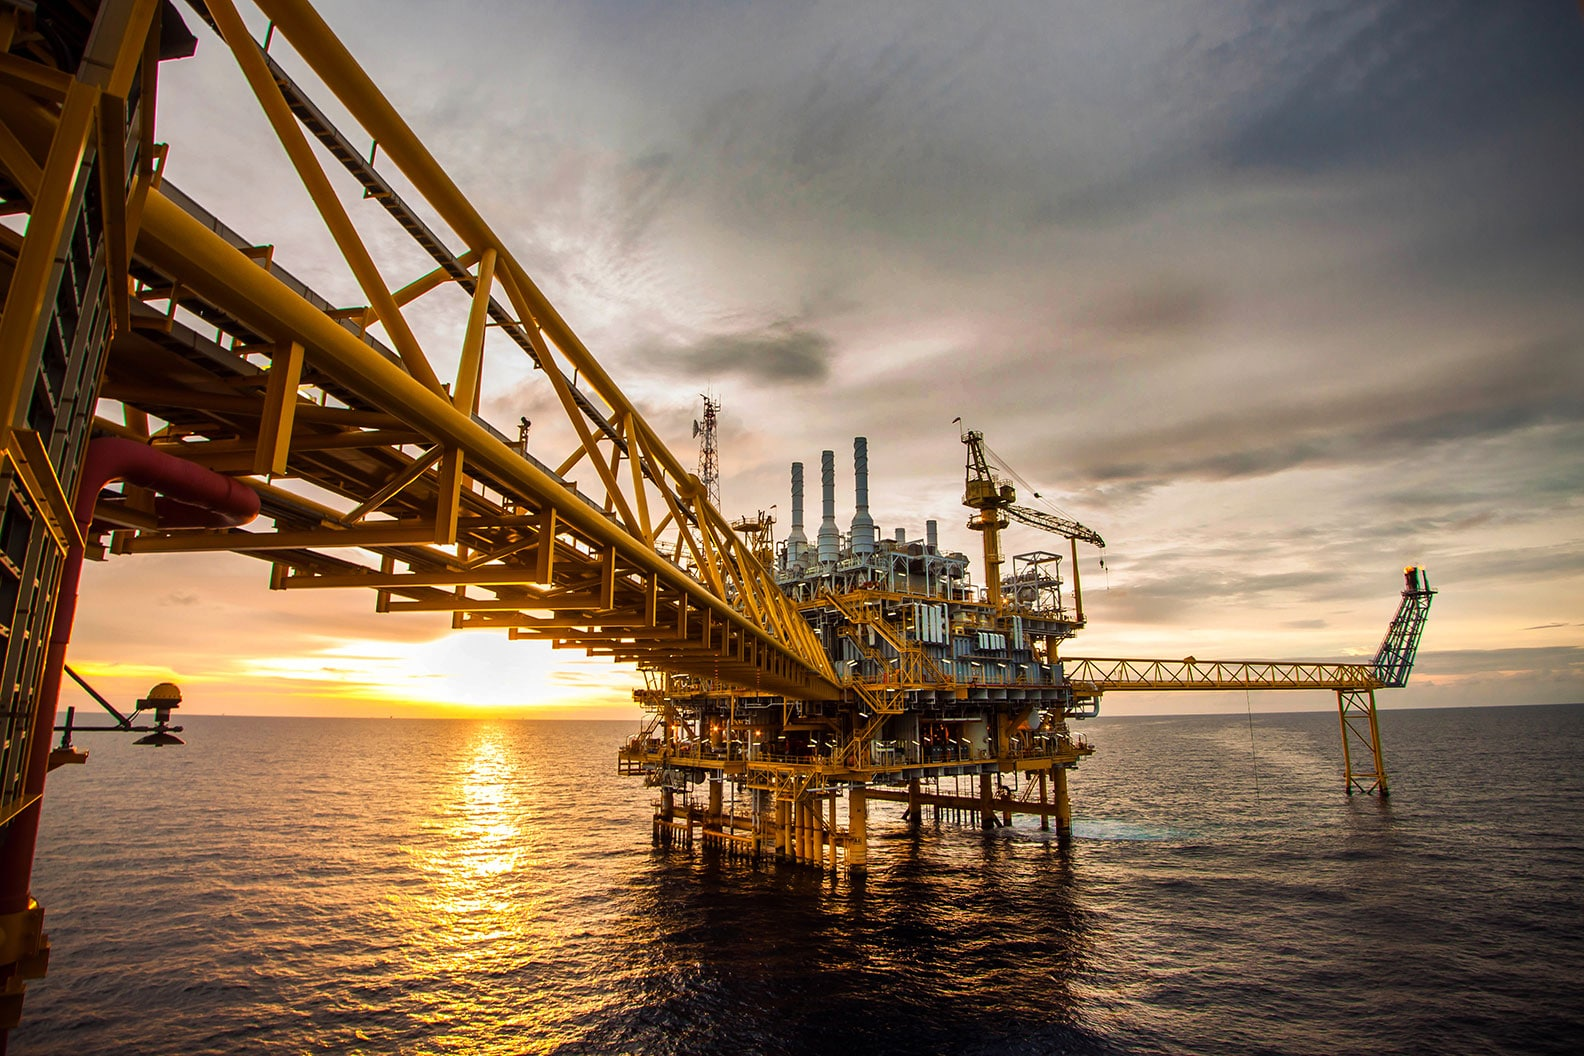 Oil/gas rig